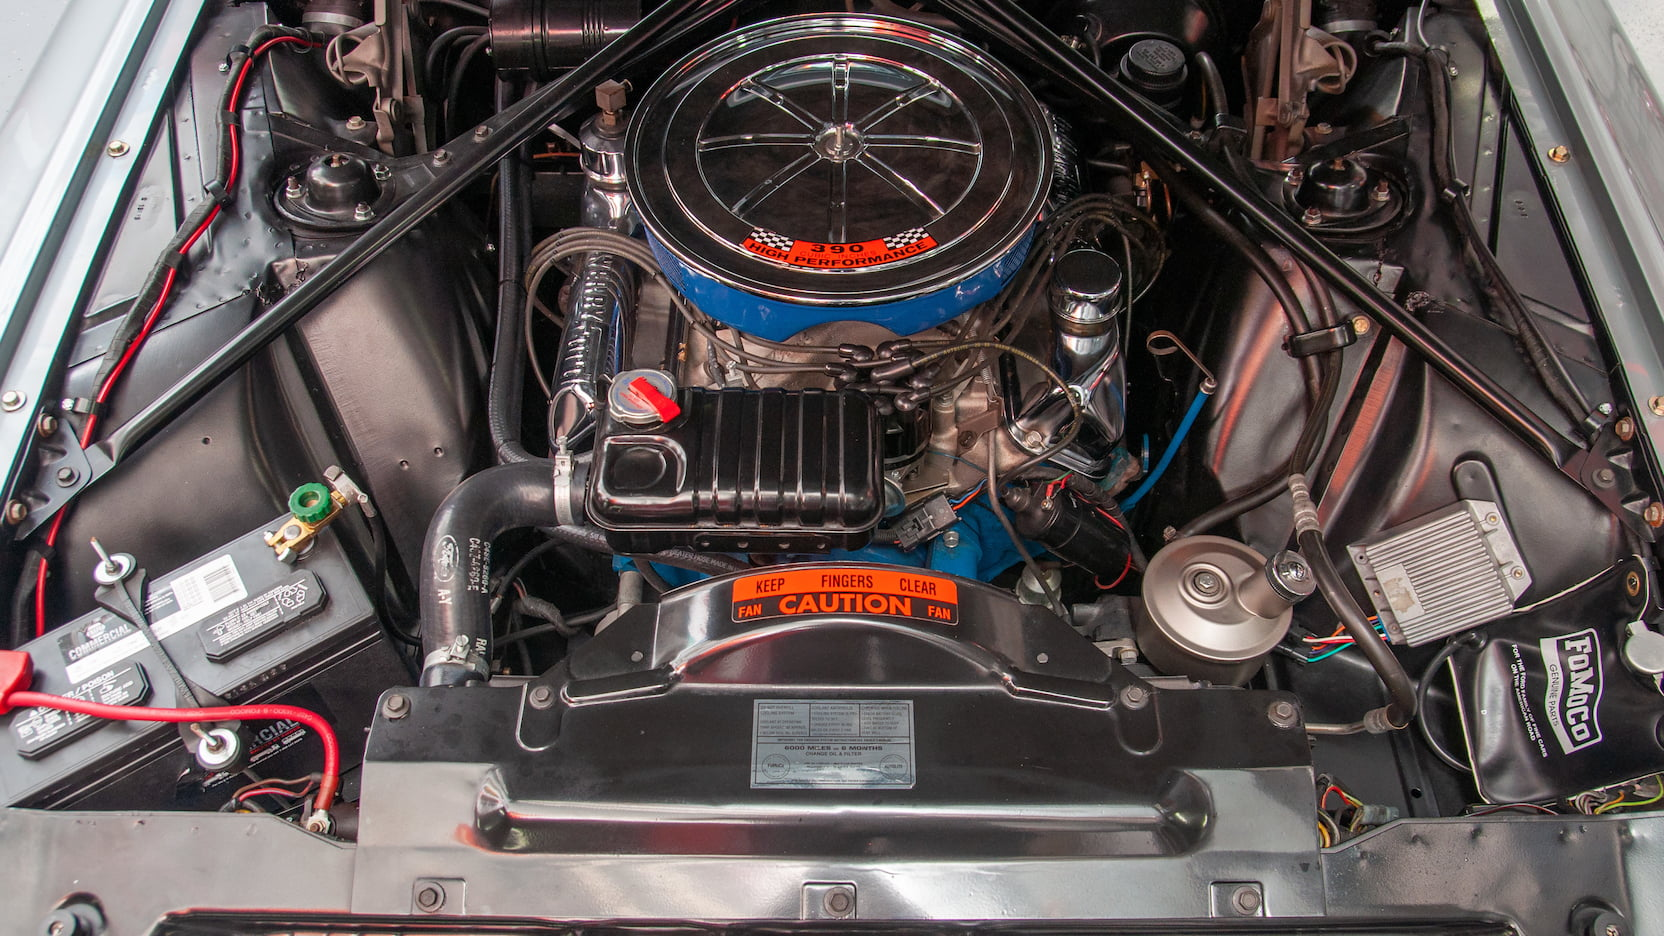 1964 Ford Thunderbird engine